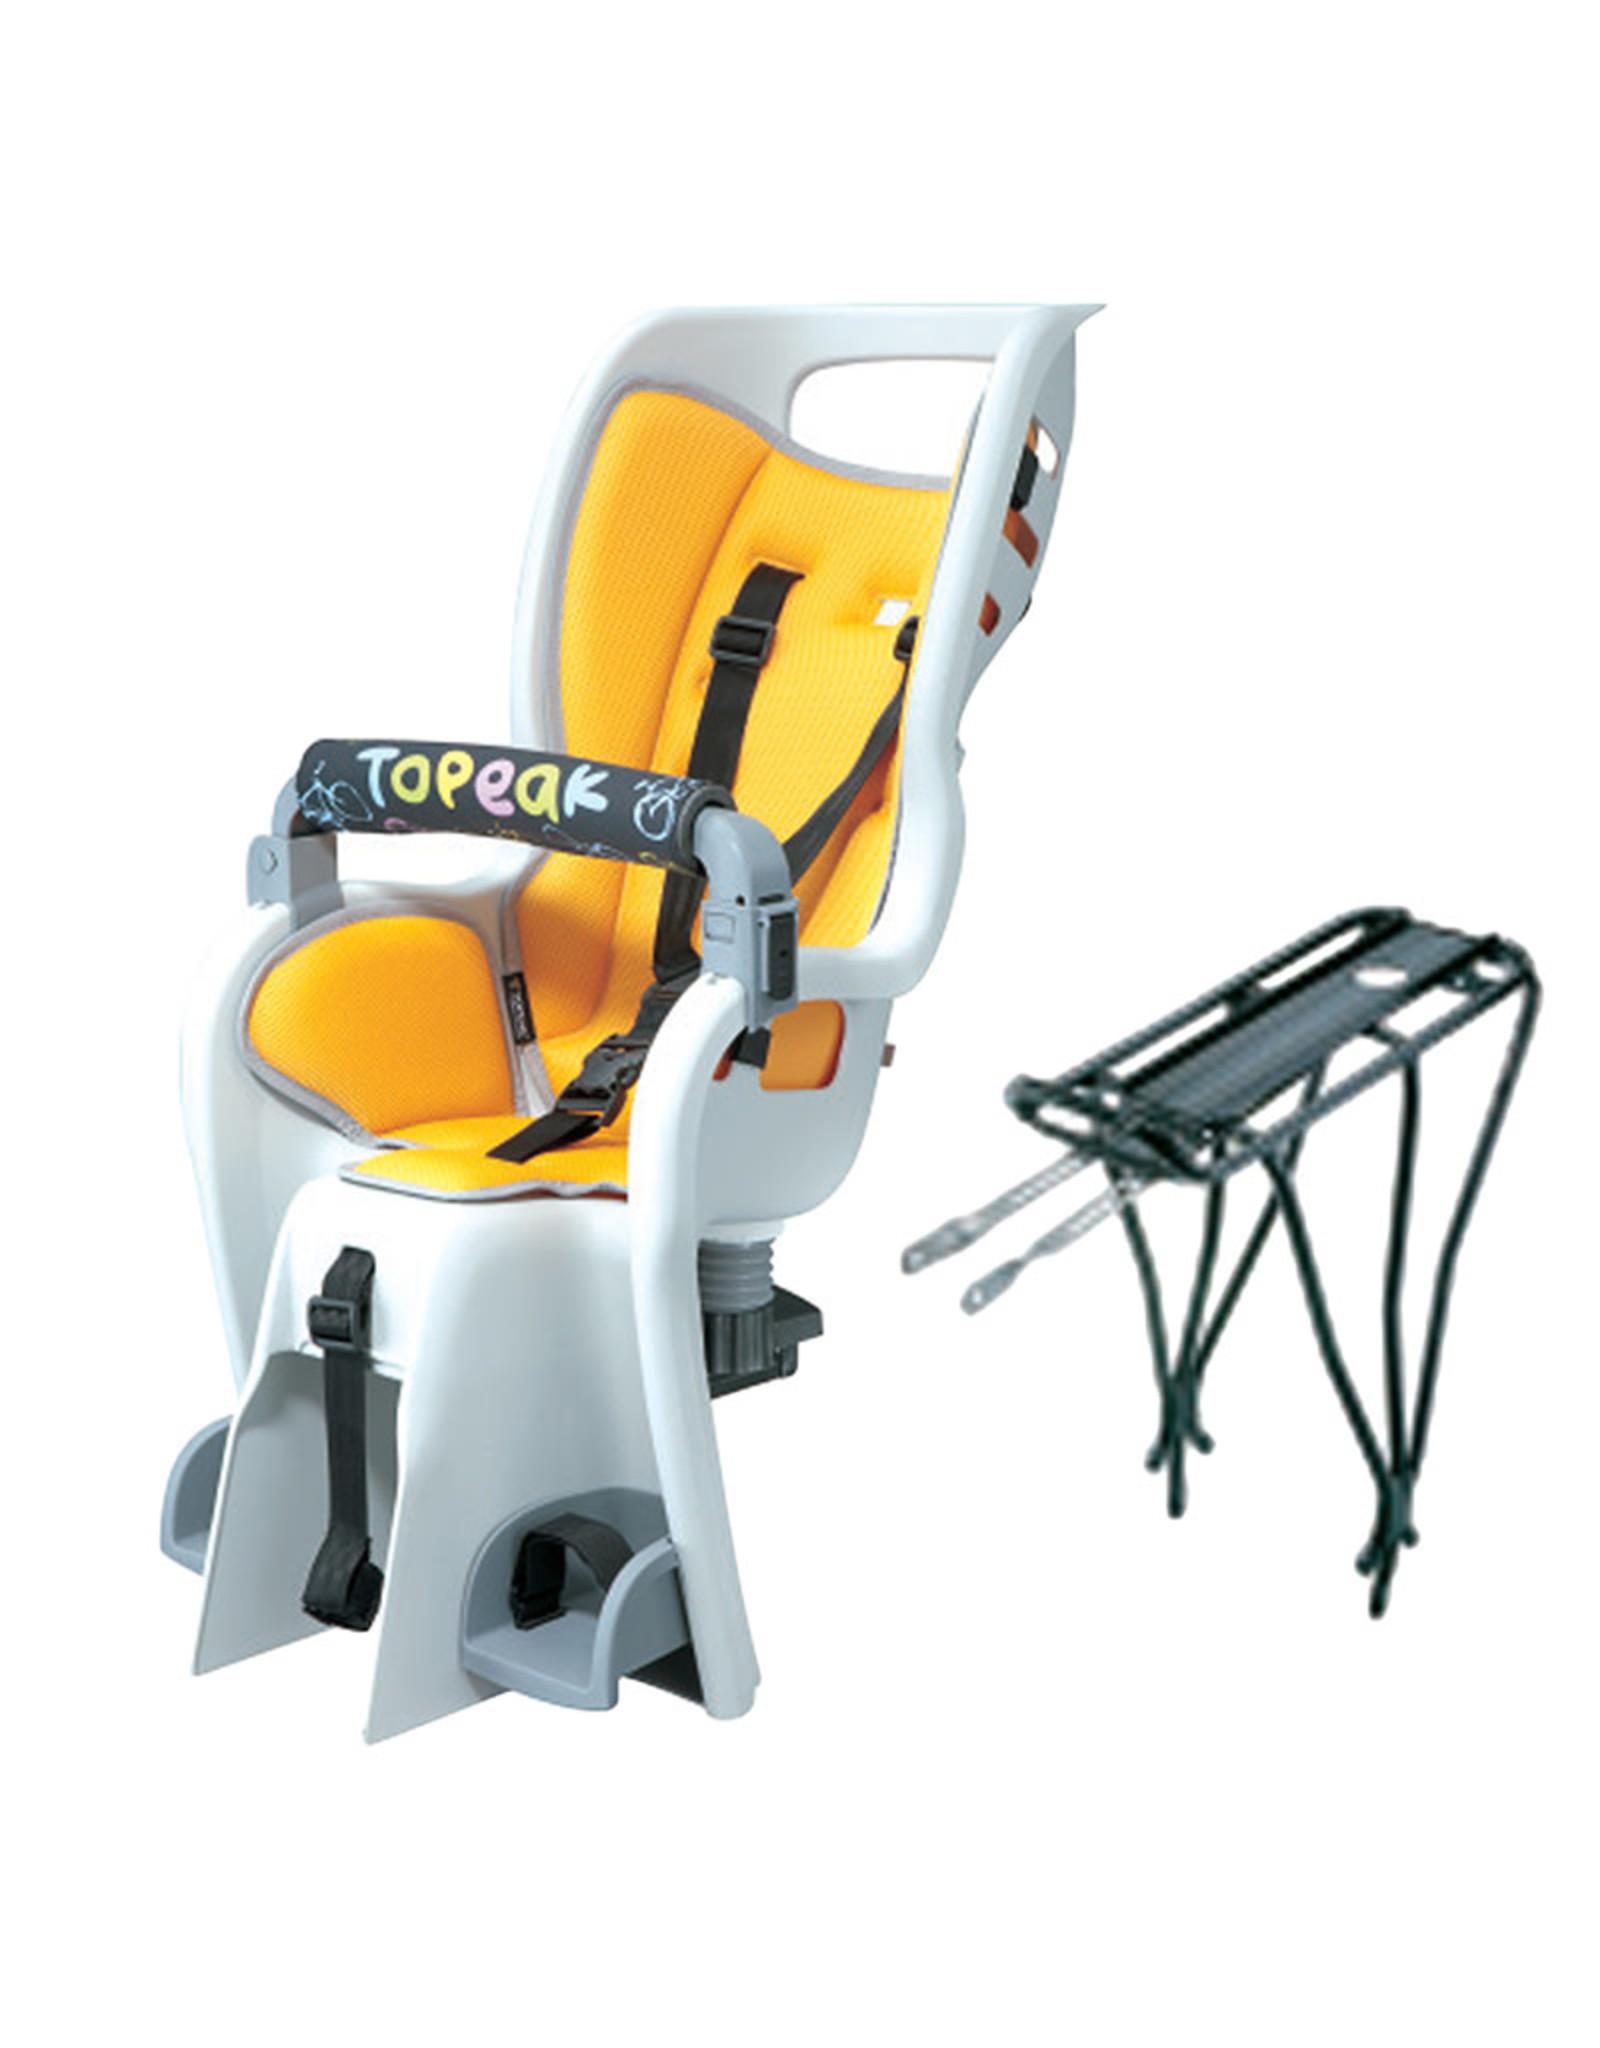 Topeak BABY SEAT TOPEAK BABYSEAT II 15 wRACK